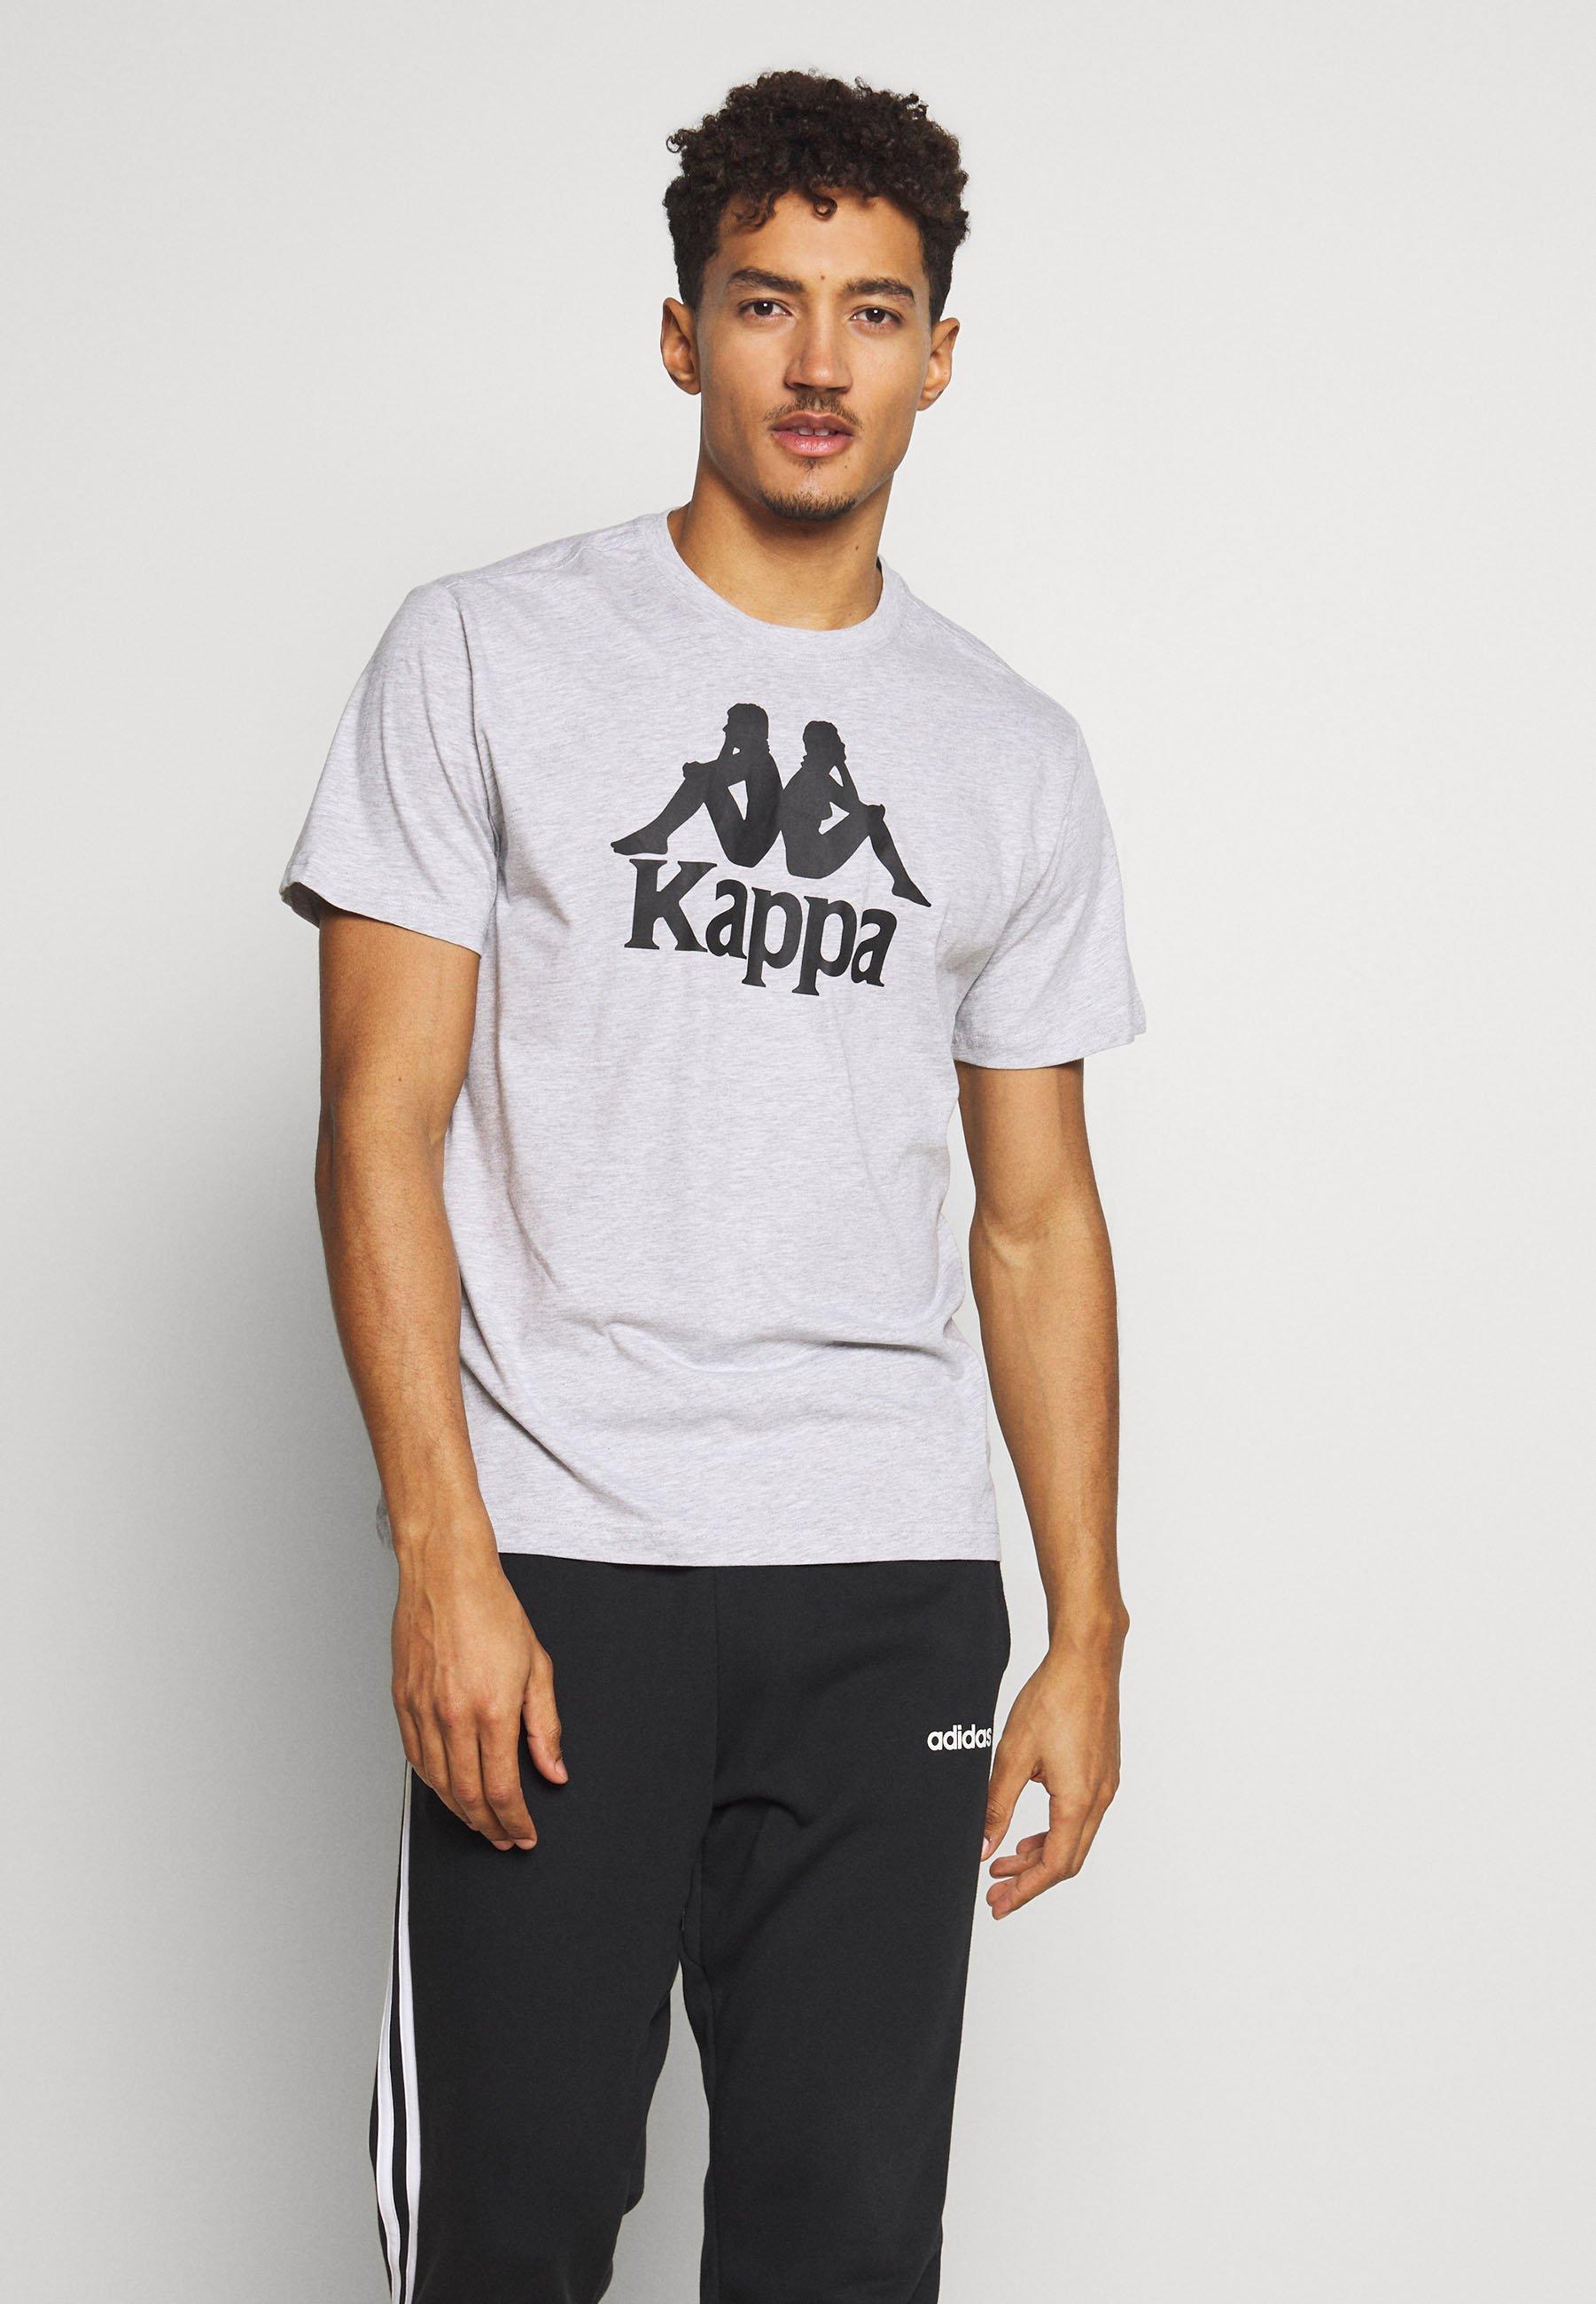 Kappa HEDDA T shirt imprimé caviar ZALANDO.FR